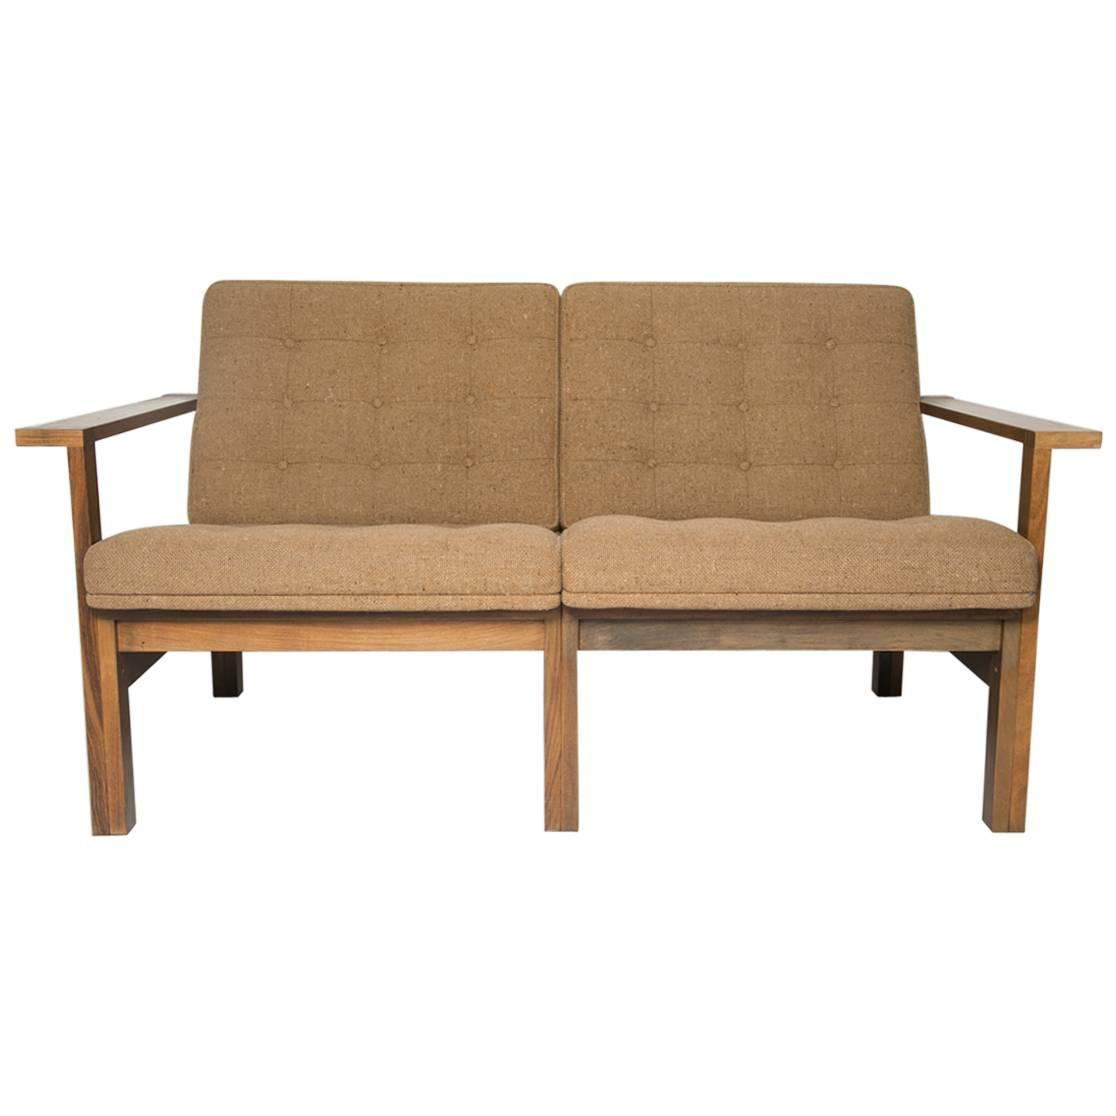 moduline rosewood sofa love seat for sale at 1stdibs. Black Bedroom Furniture Sets. Home Design Ideas